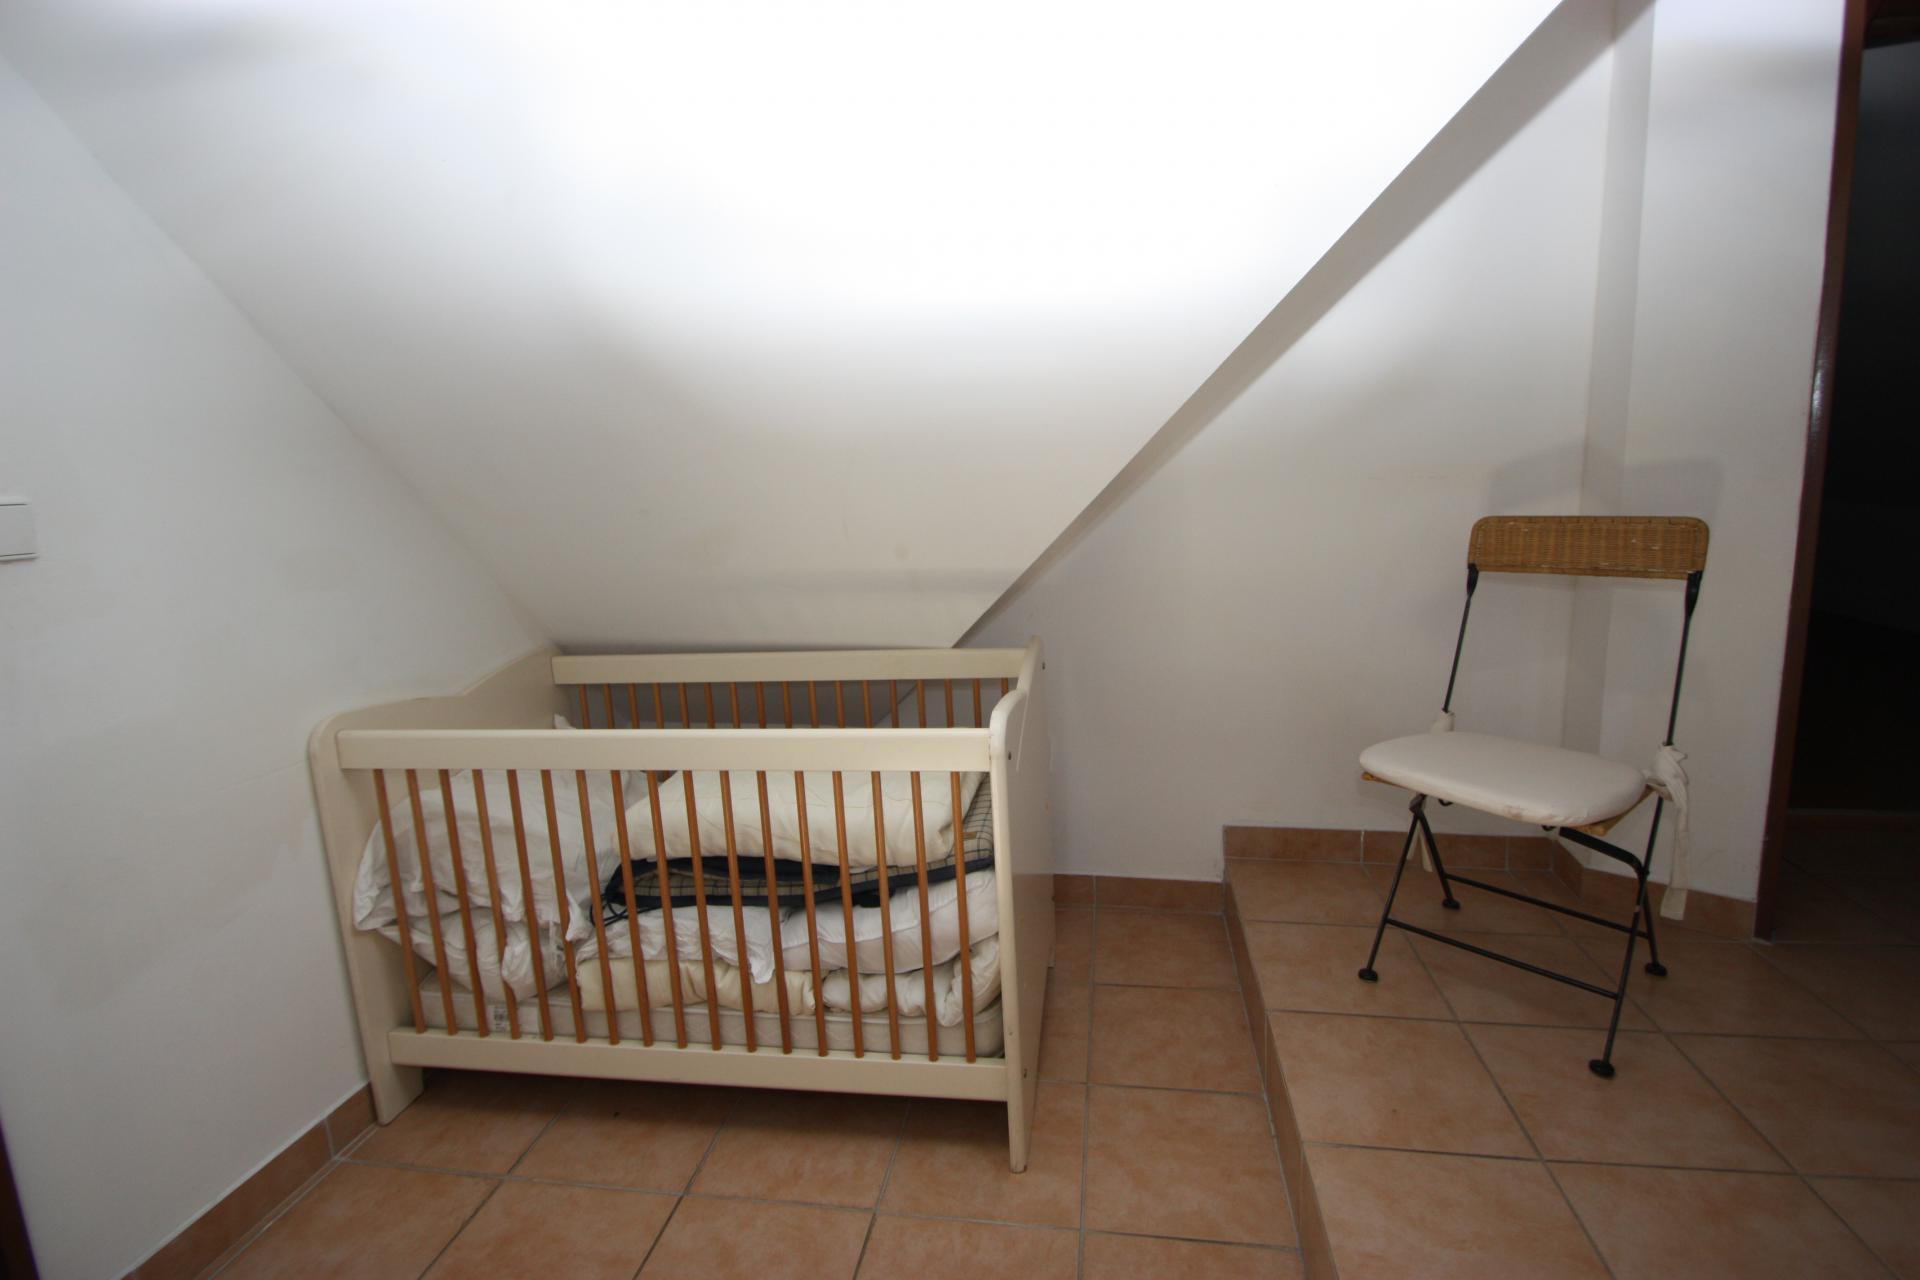 Overloop met babybed